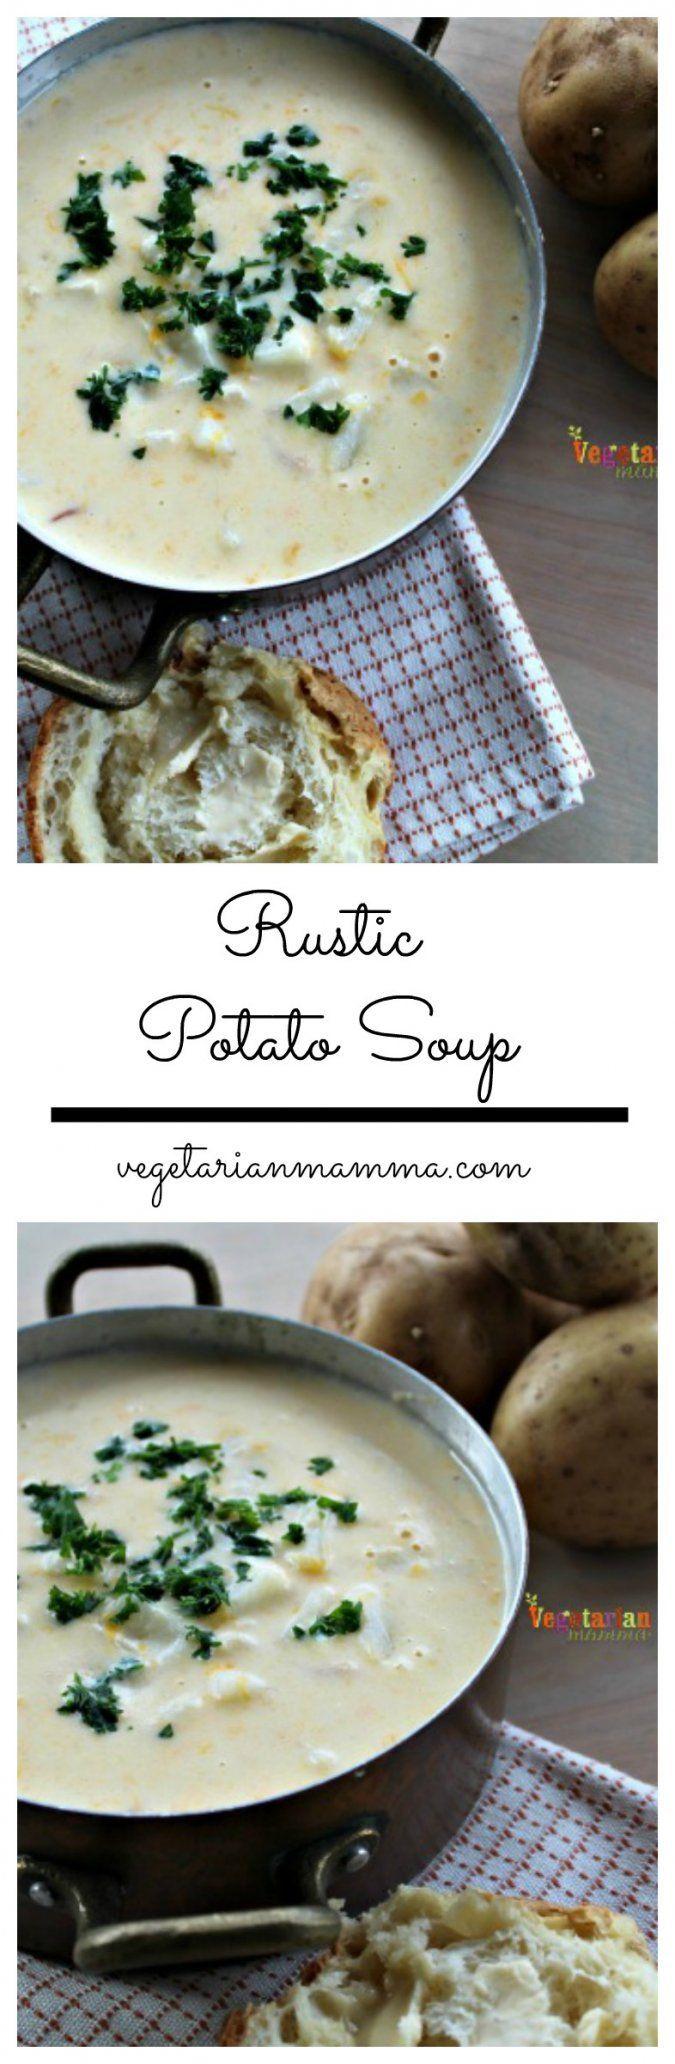 Rustc Potato Soup @vegetarianmamma.com